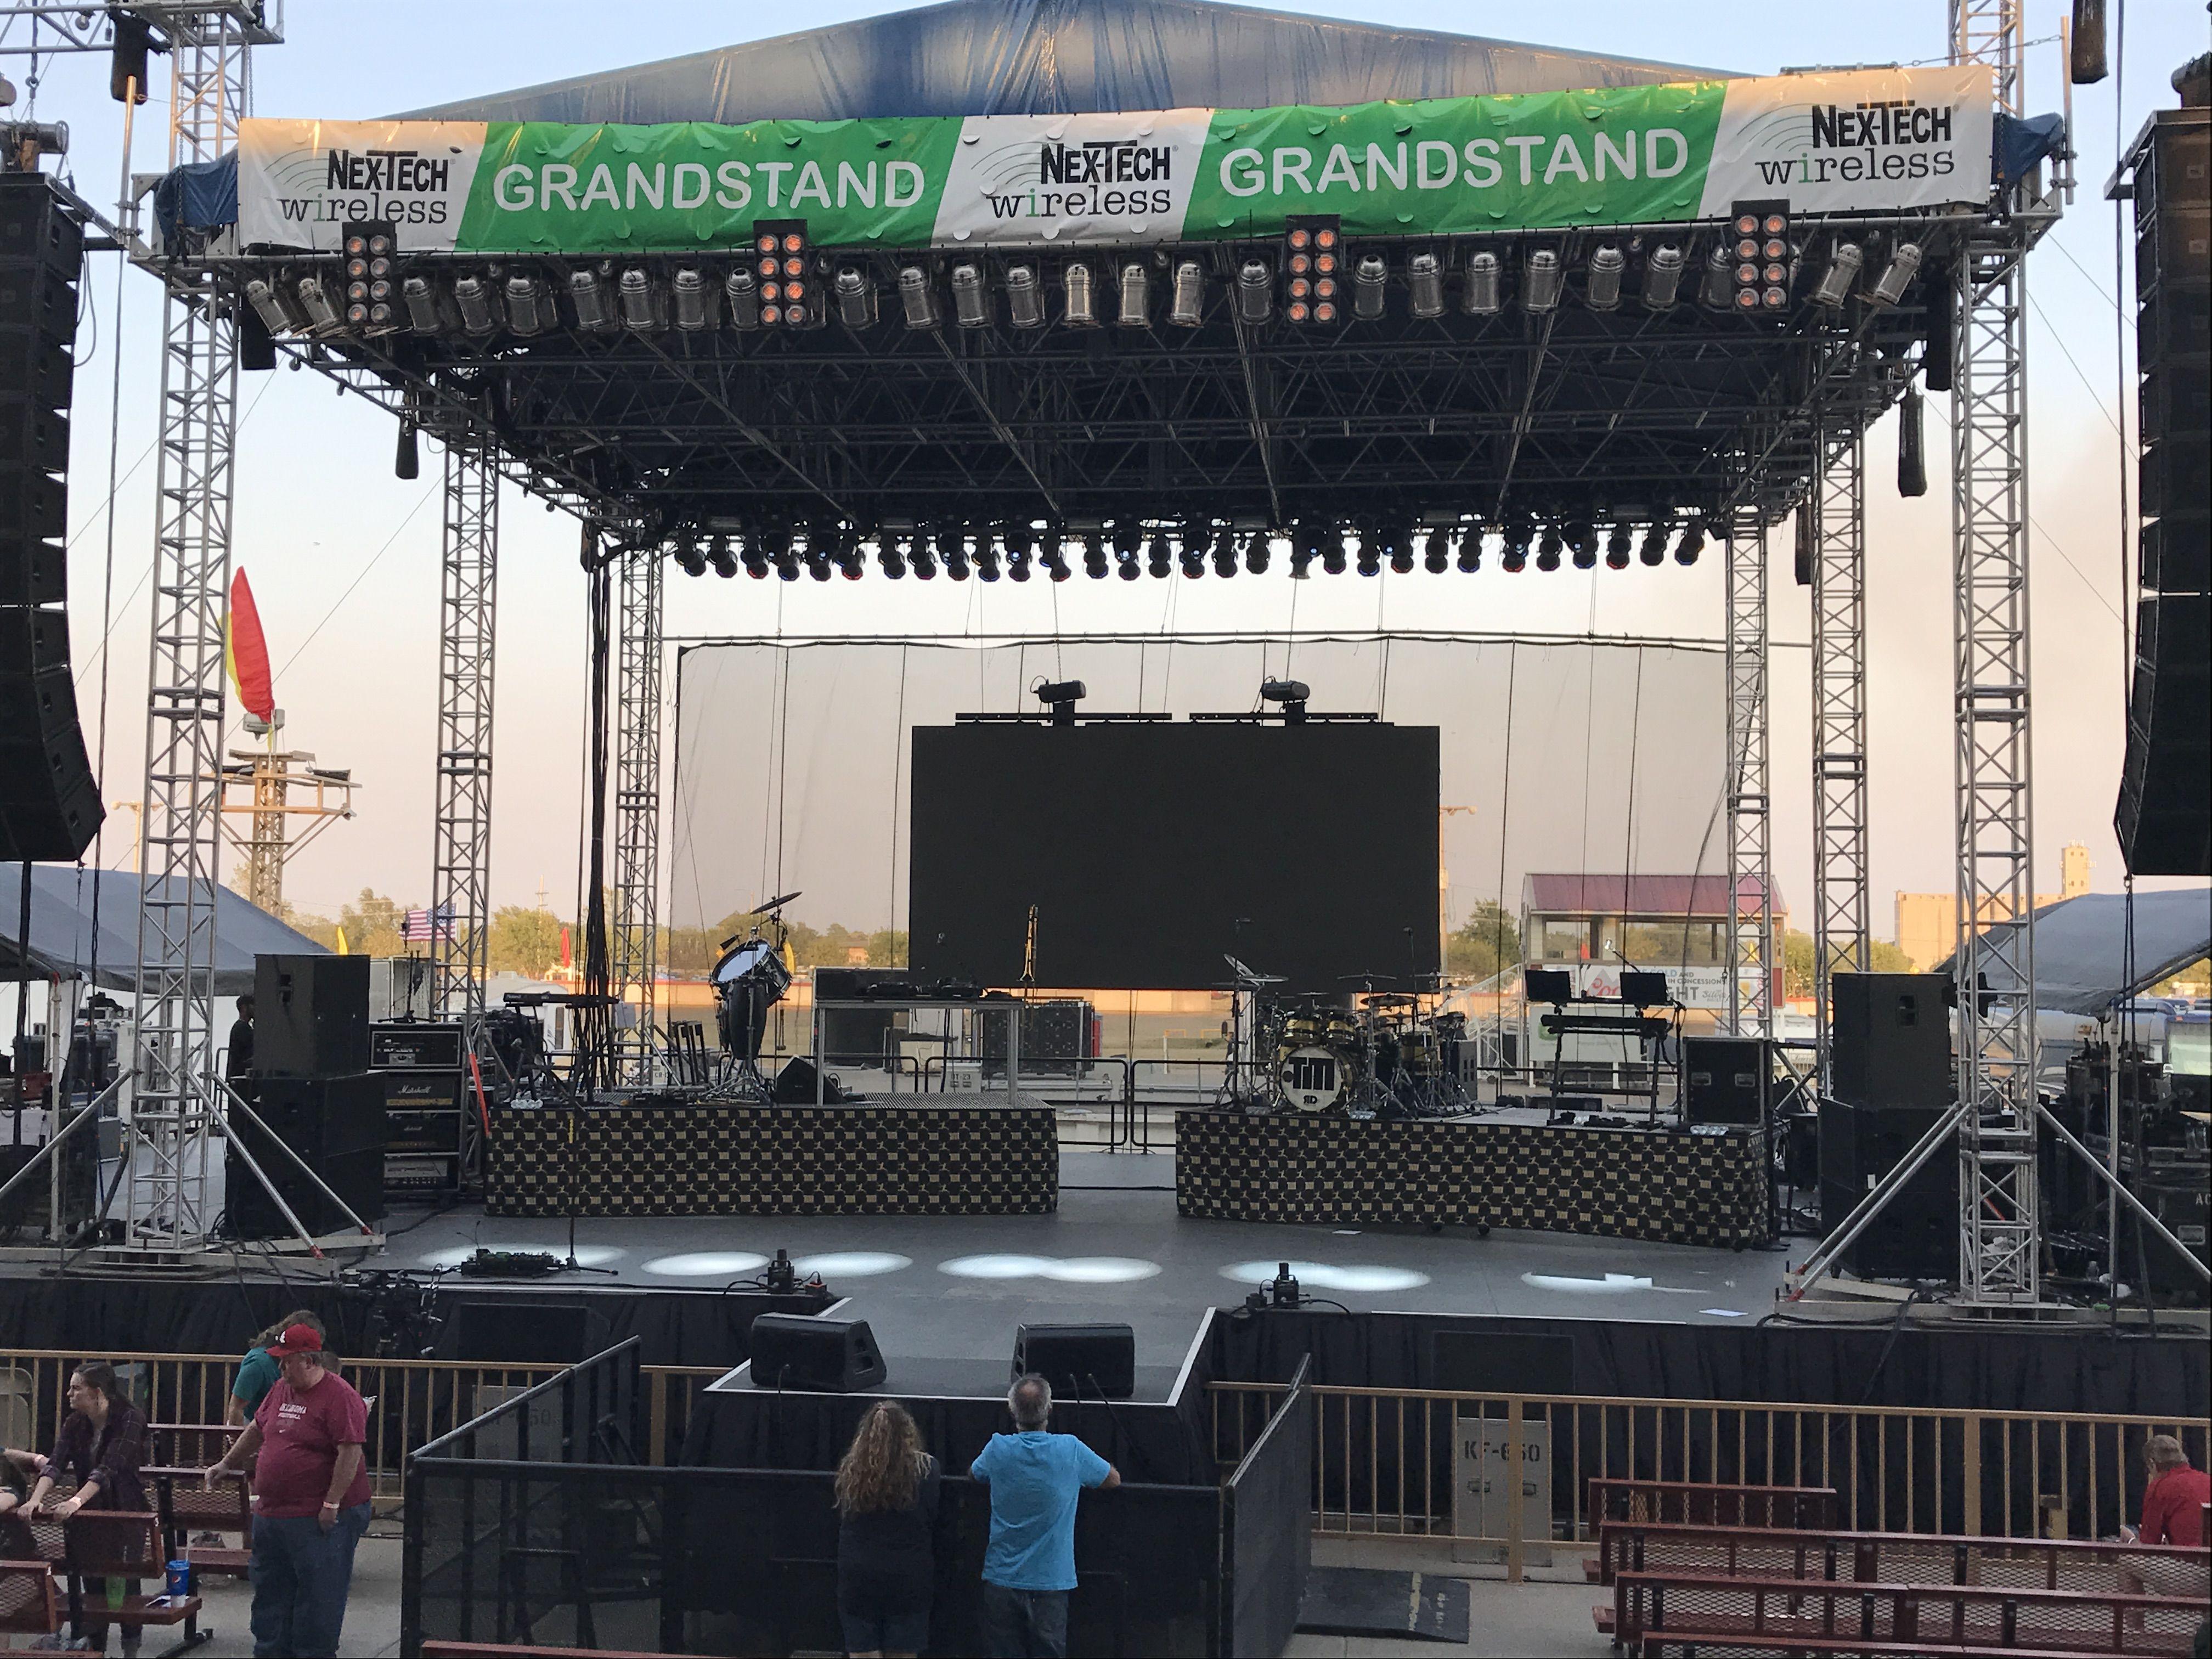 NTW Grandstand Kansas state, Phone plans, Kansas